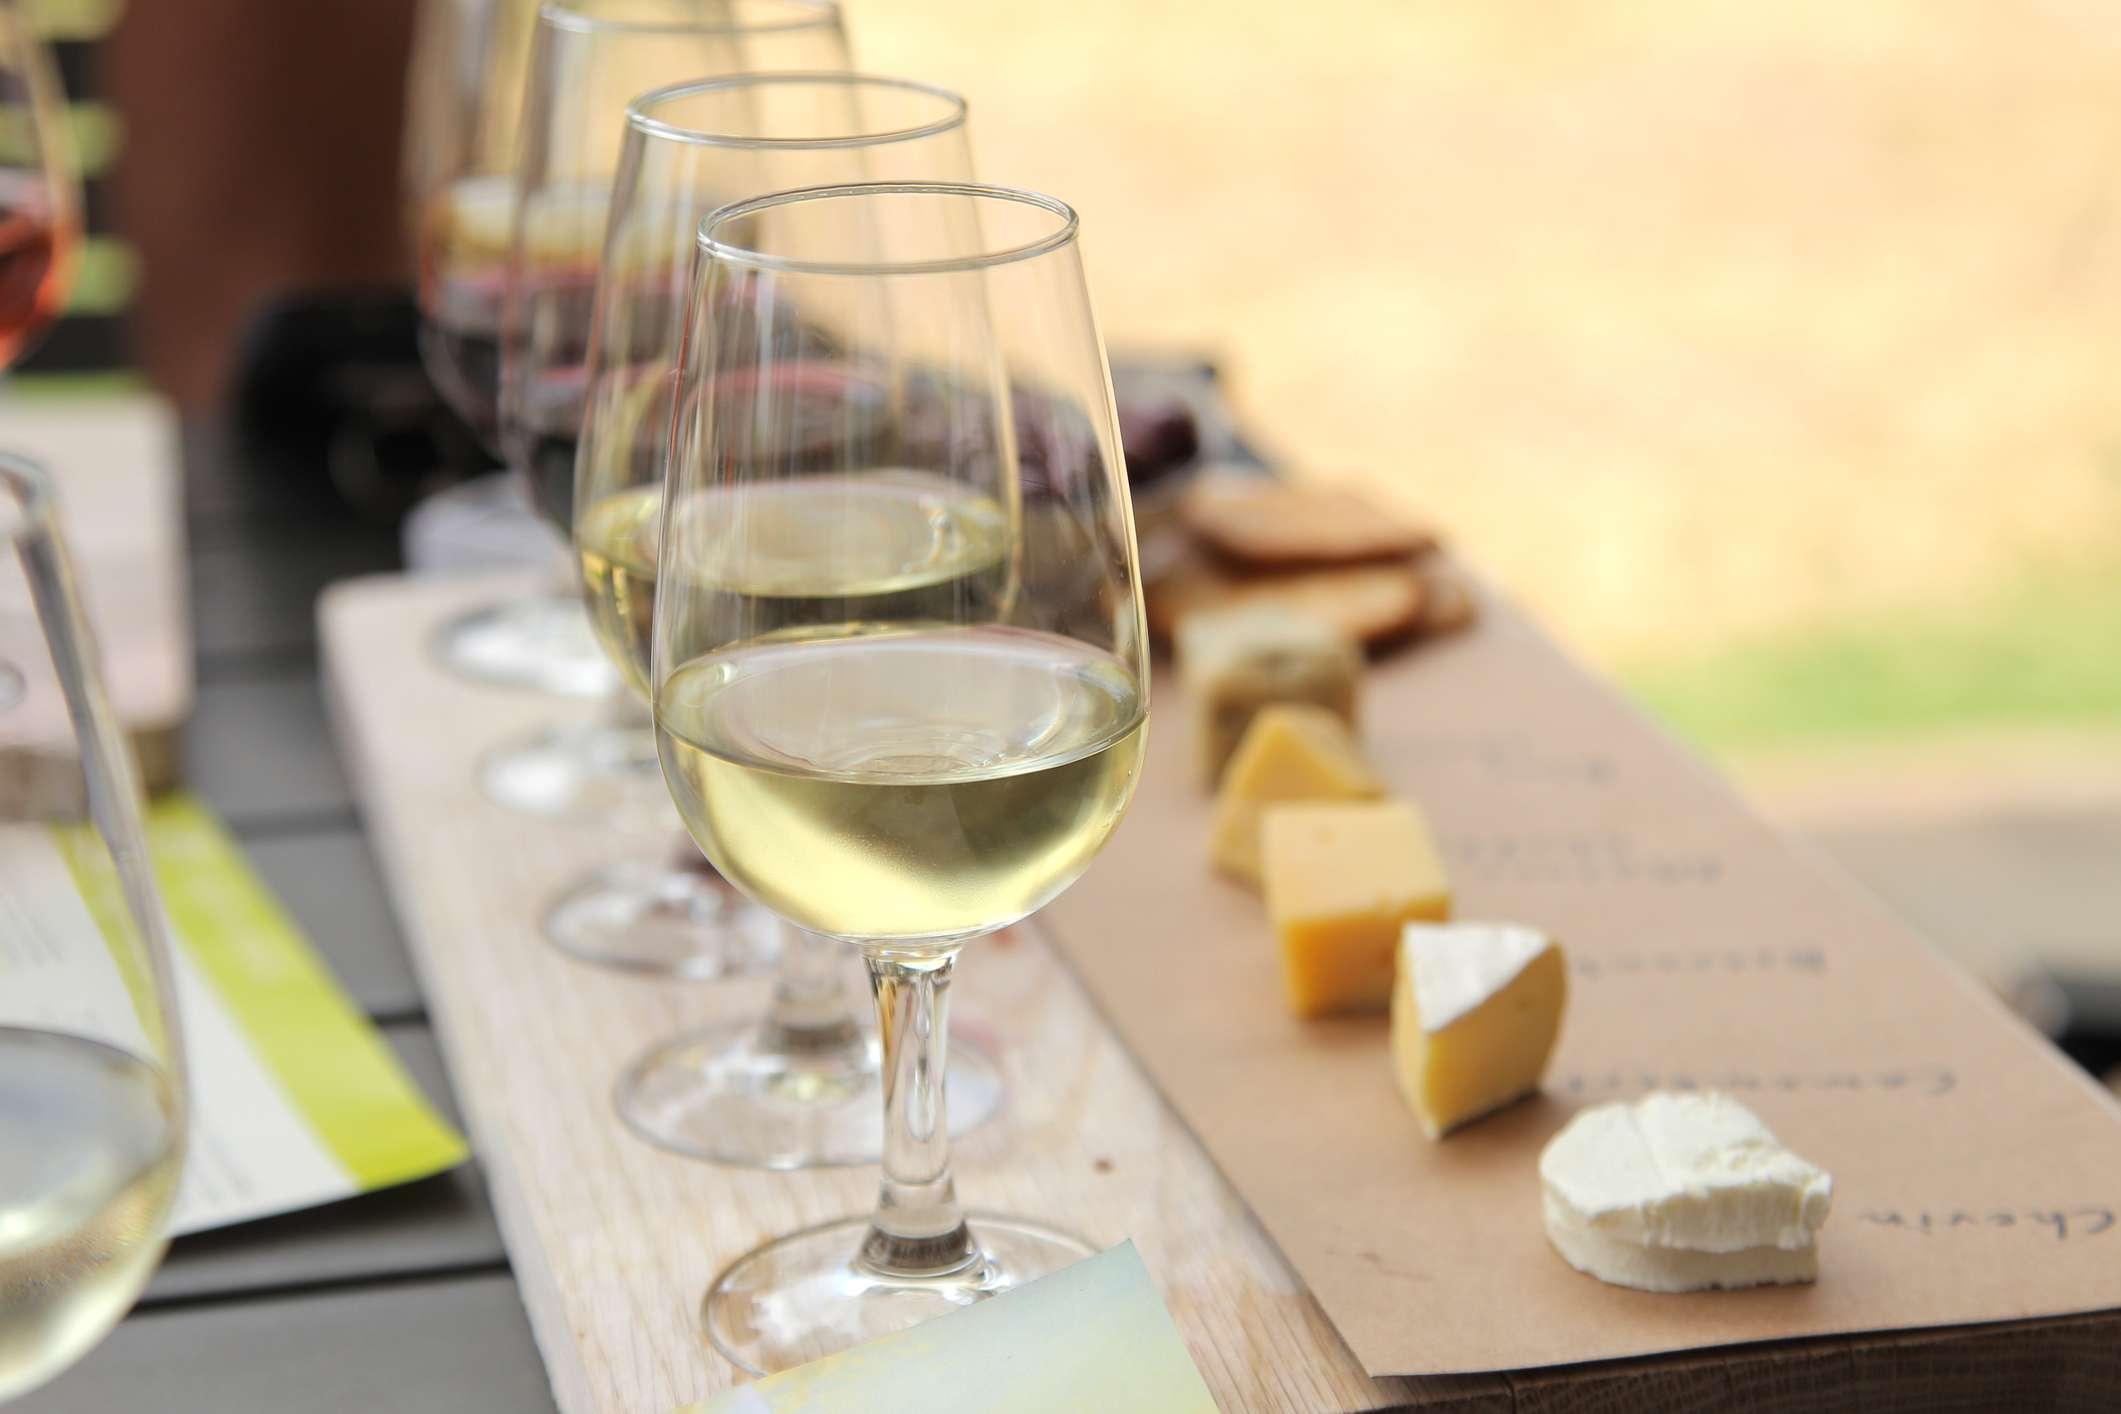 Wine tasting flight in outdoor setting